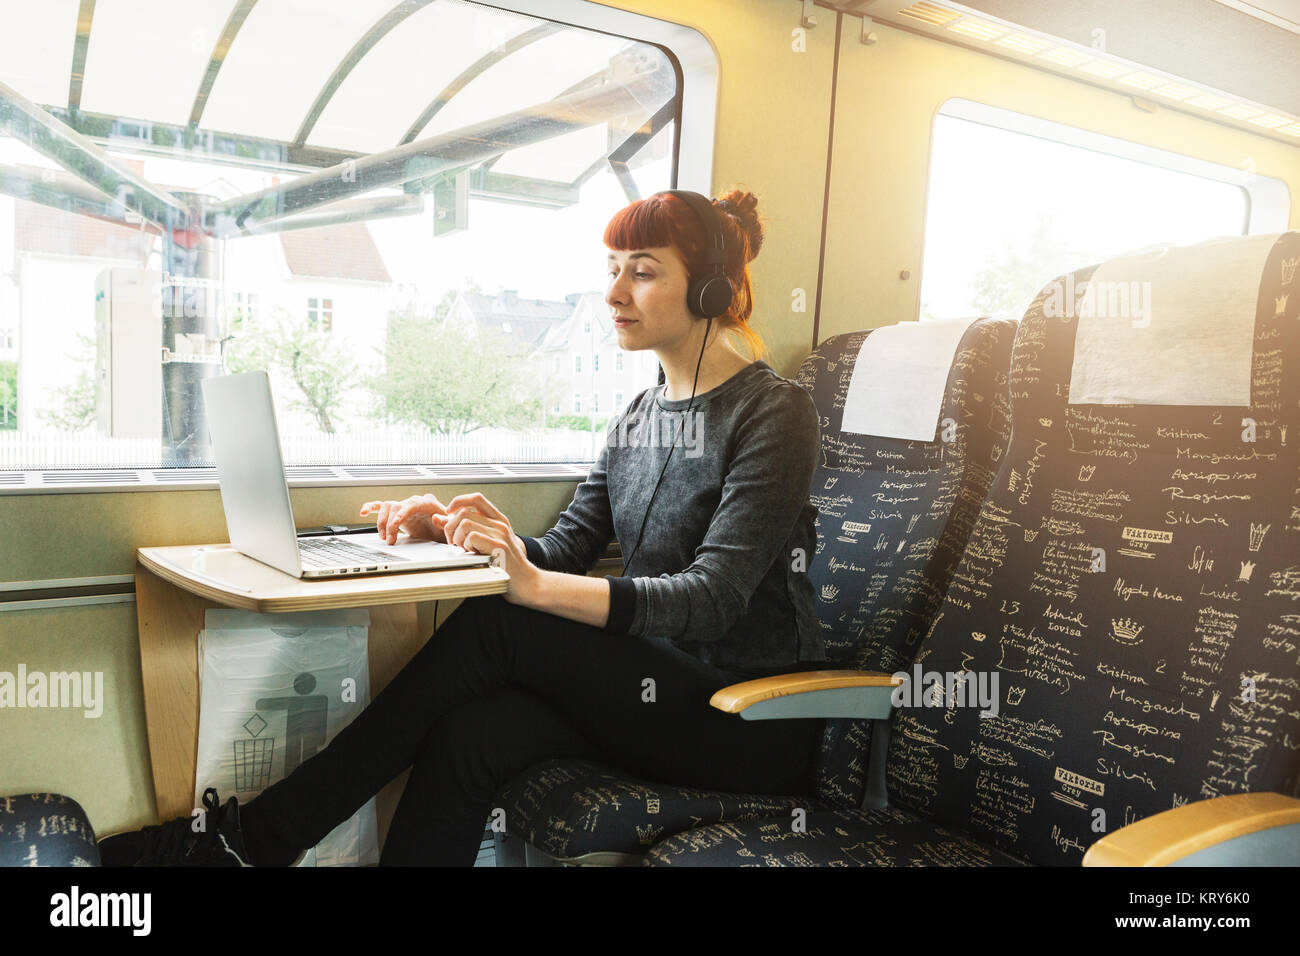 Frau mit Laptop im Zug Stockbild